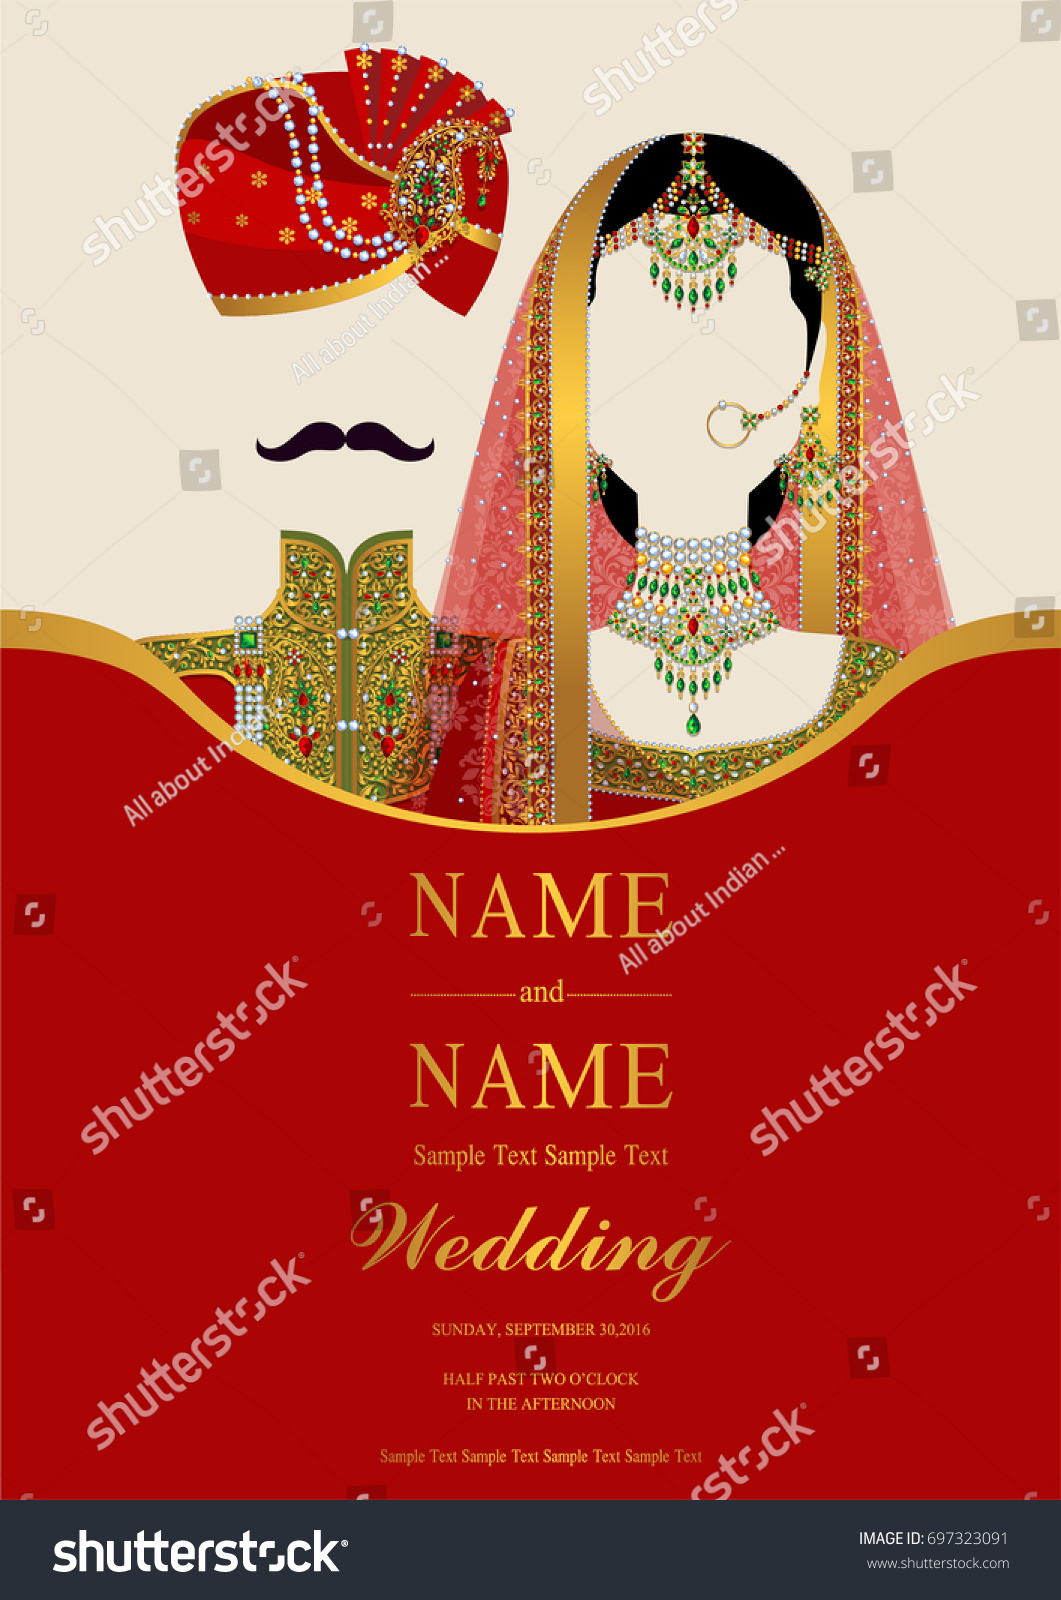 wedding invitation card templates indian man stock vector 697323091 shutterstock. Black Bedroom Furniture Sets. Home Design Ideas